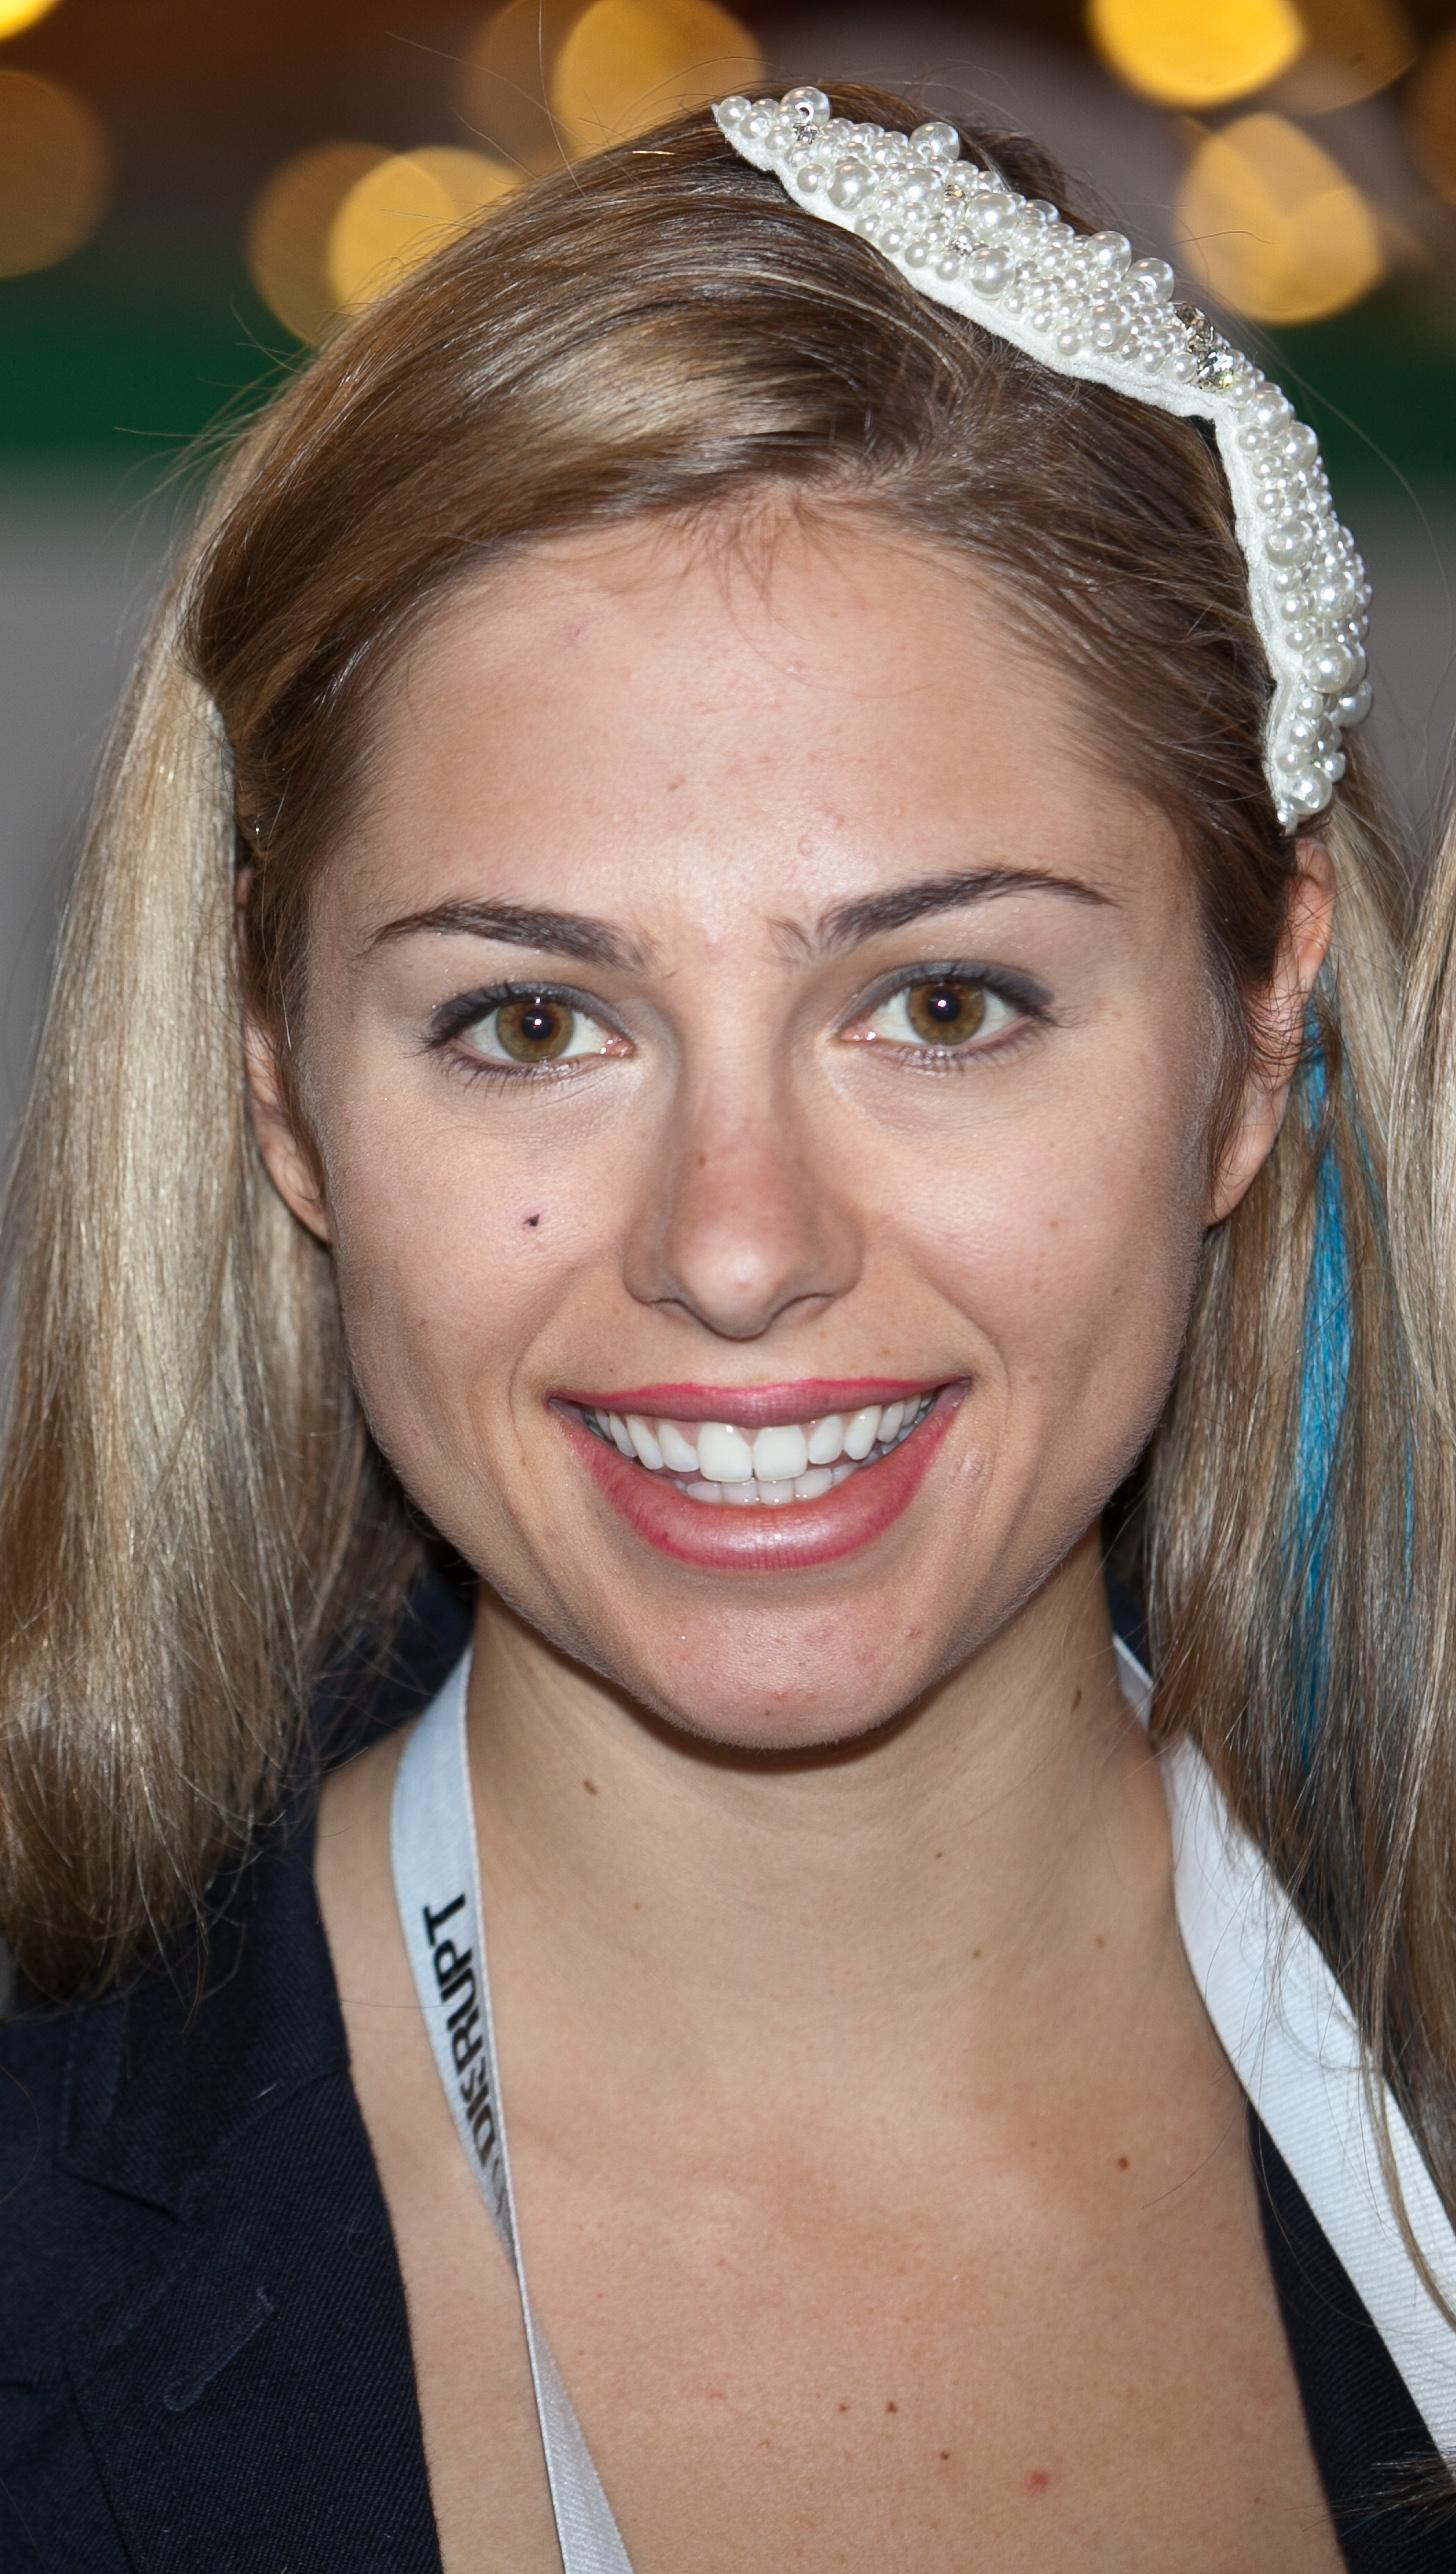 Sarah Austin Internet Celebrity Wikipedia